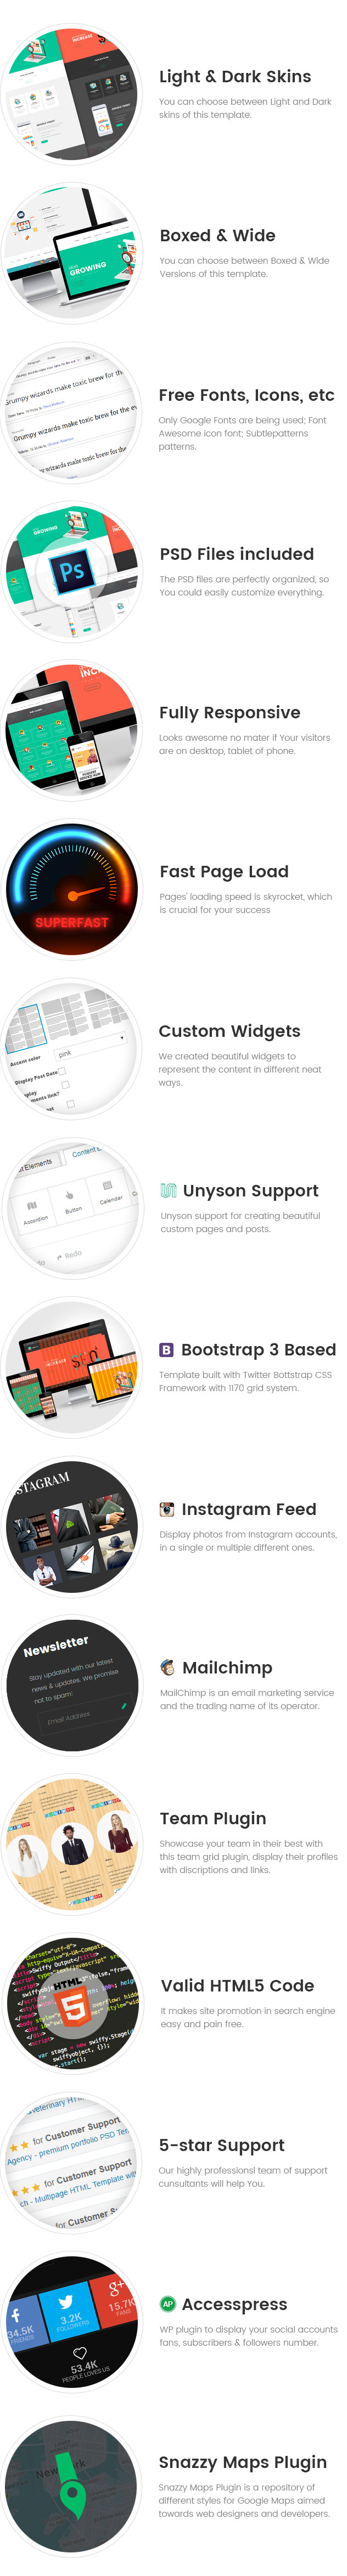 SEO Boost - SEO/Digital Company WordPress theme